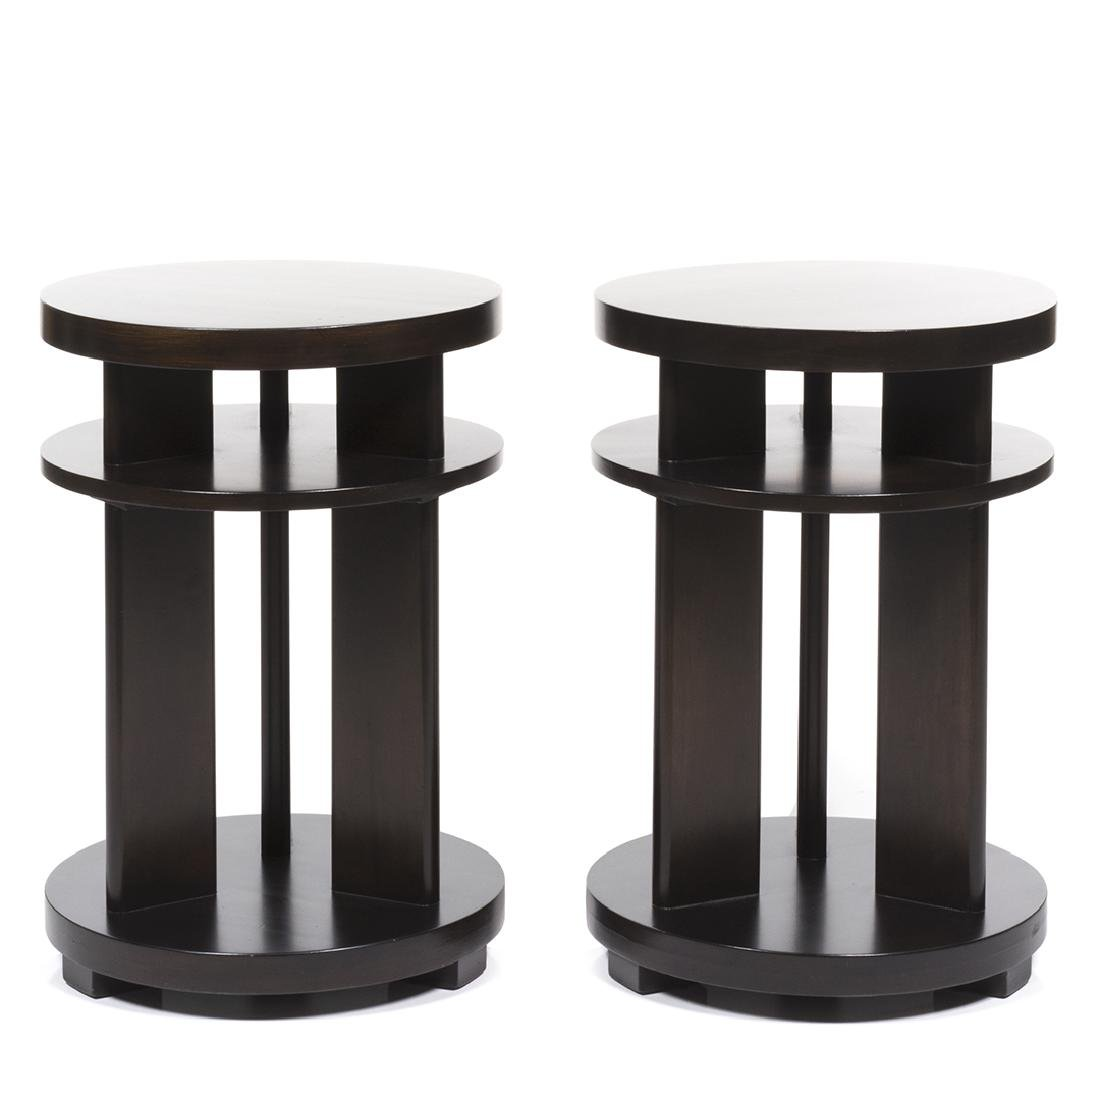 Paul Laszlo Side Tables (2)